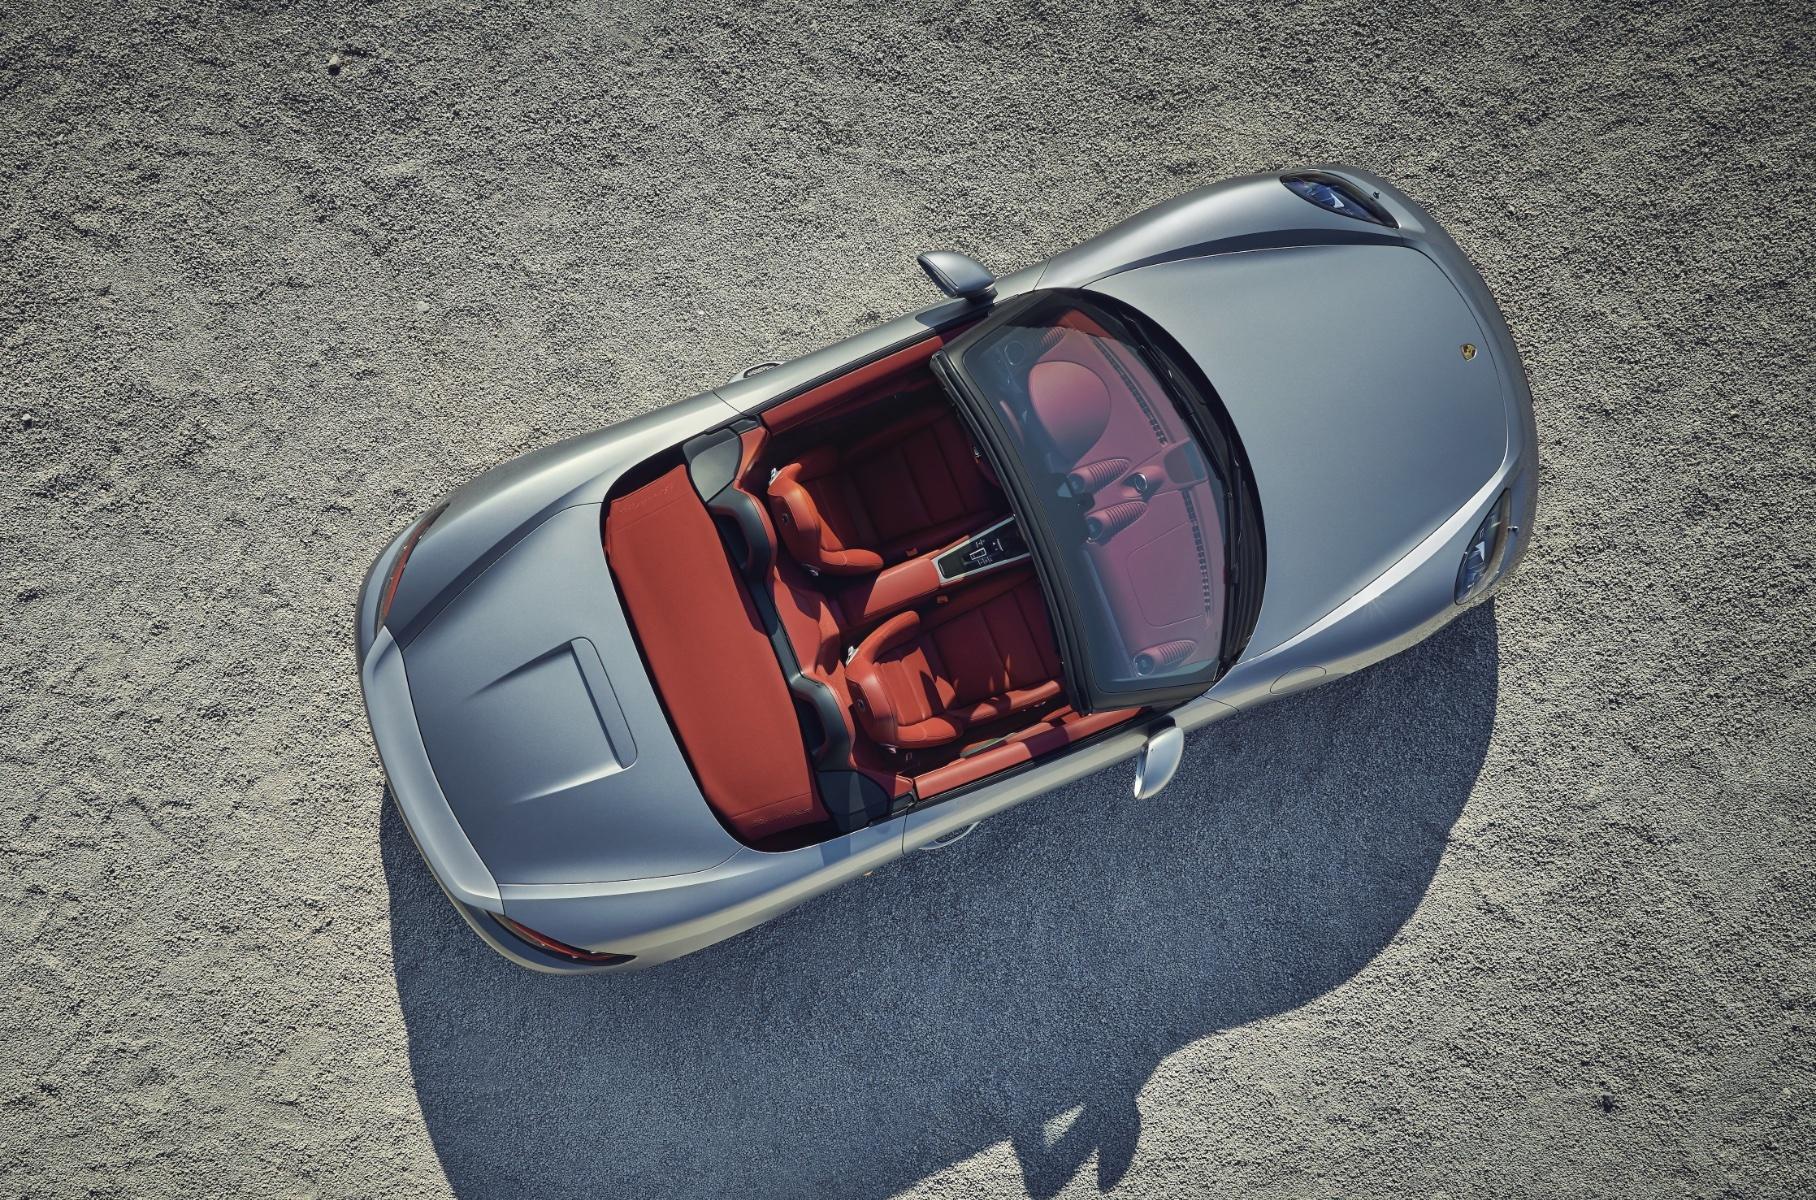 Porsche Boxster 25 Years отпразднует 25-летие модели Новости